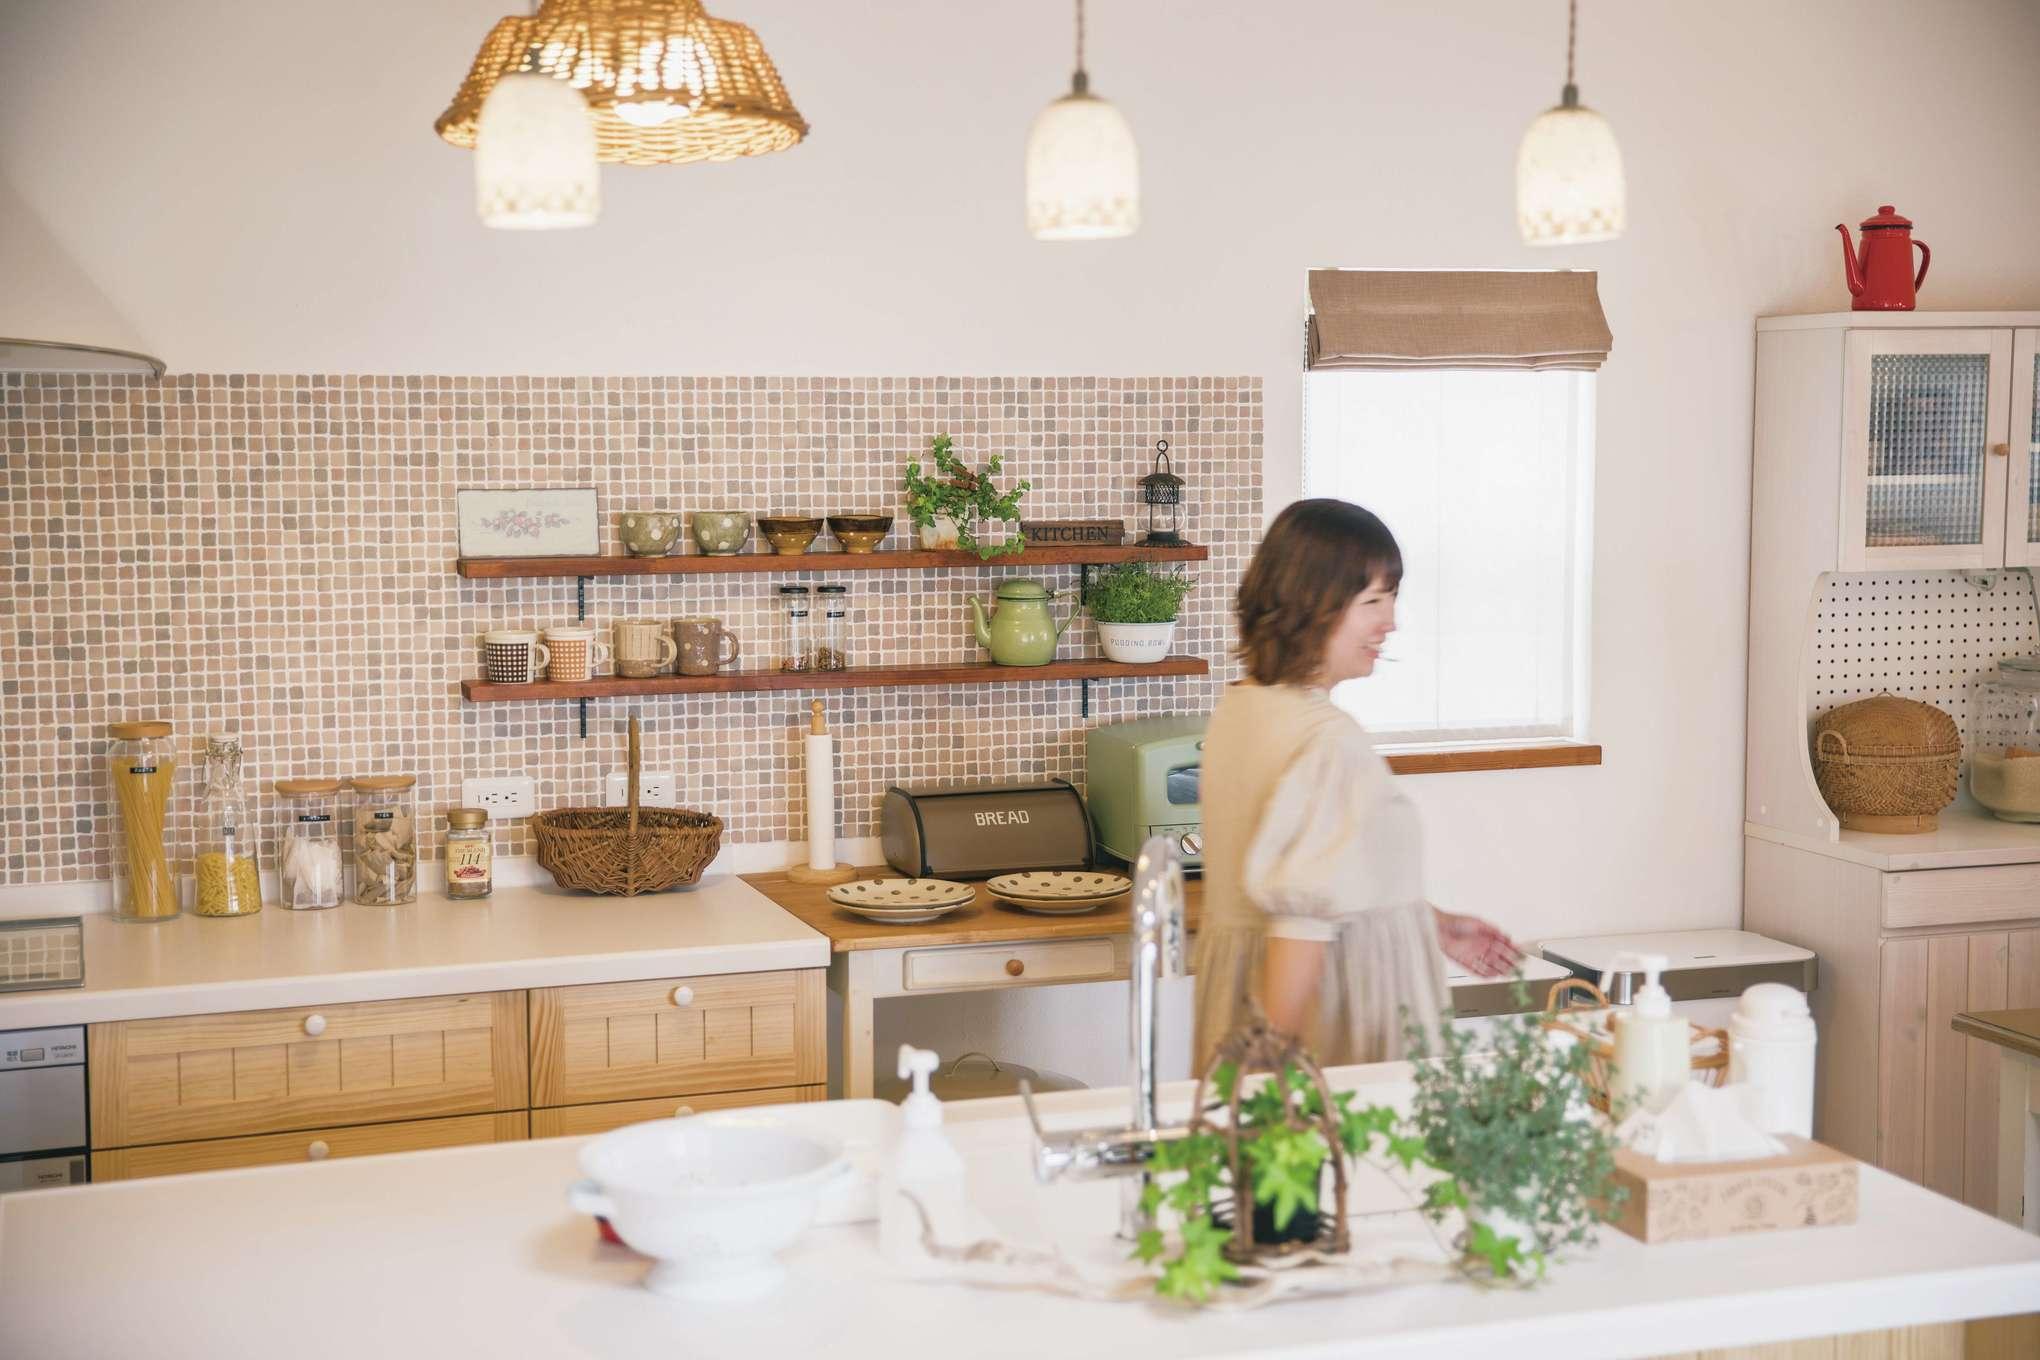 casa carina 浜北(内藤材木店)【デザイン住宅、自然素材、インテリア】カフェスタイルのオープンキッチンは、ママ友からも大好評!